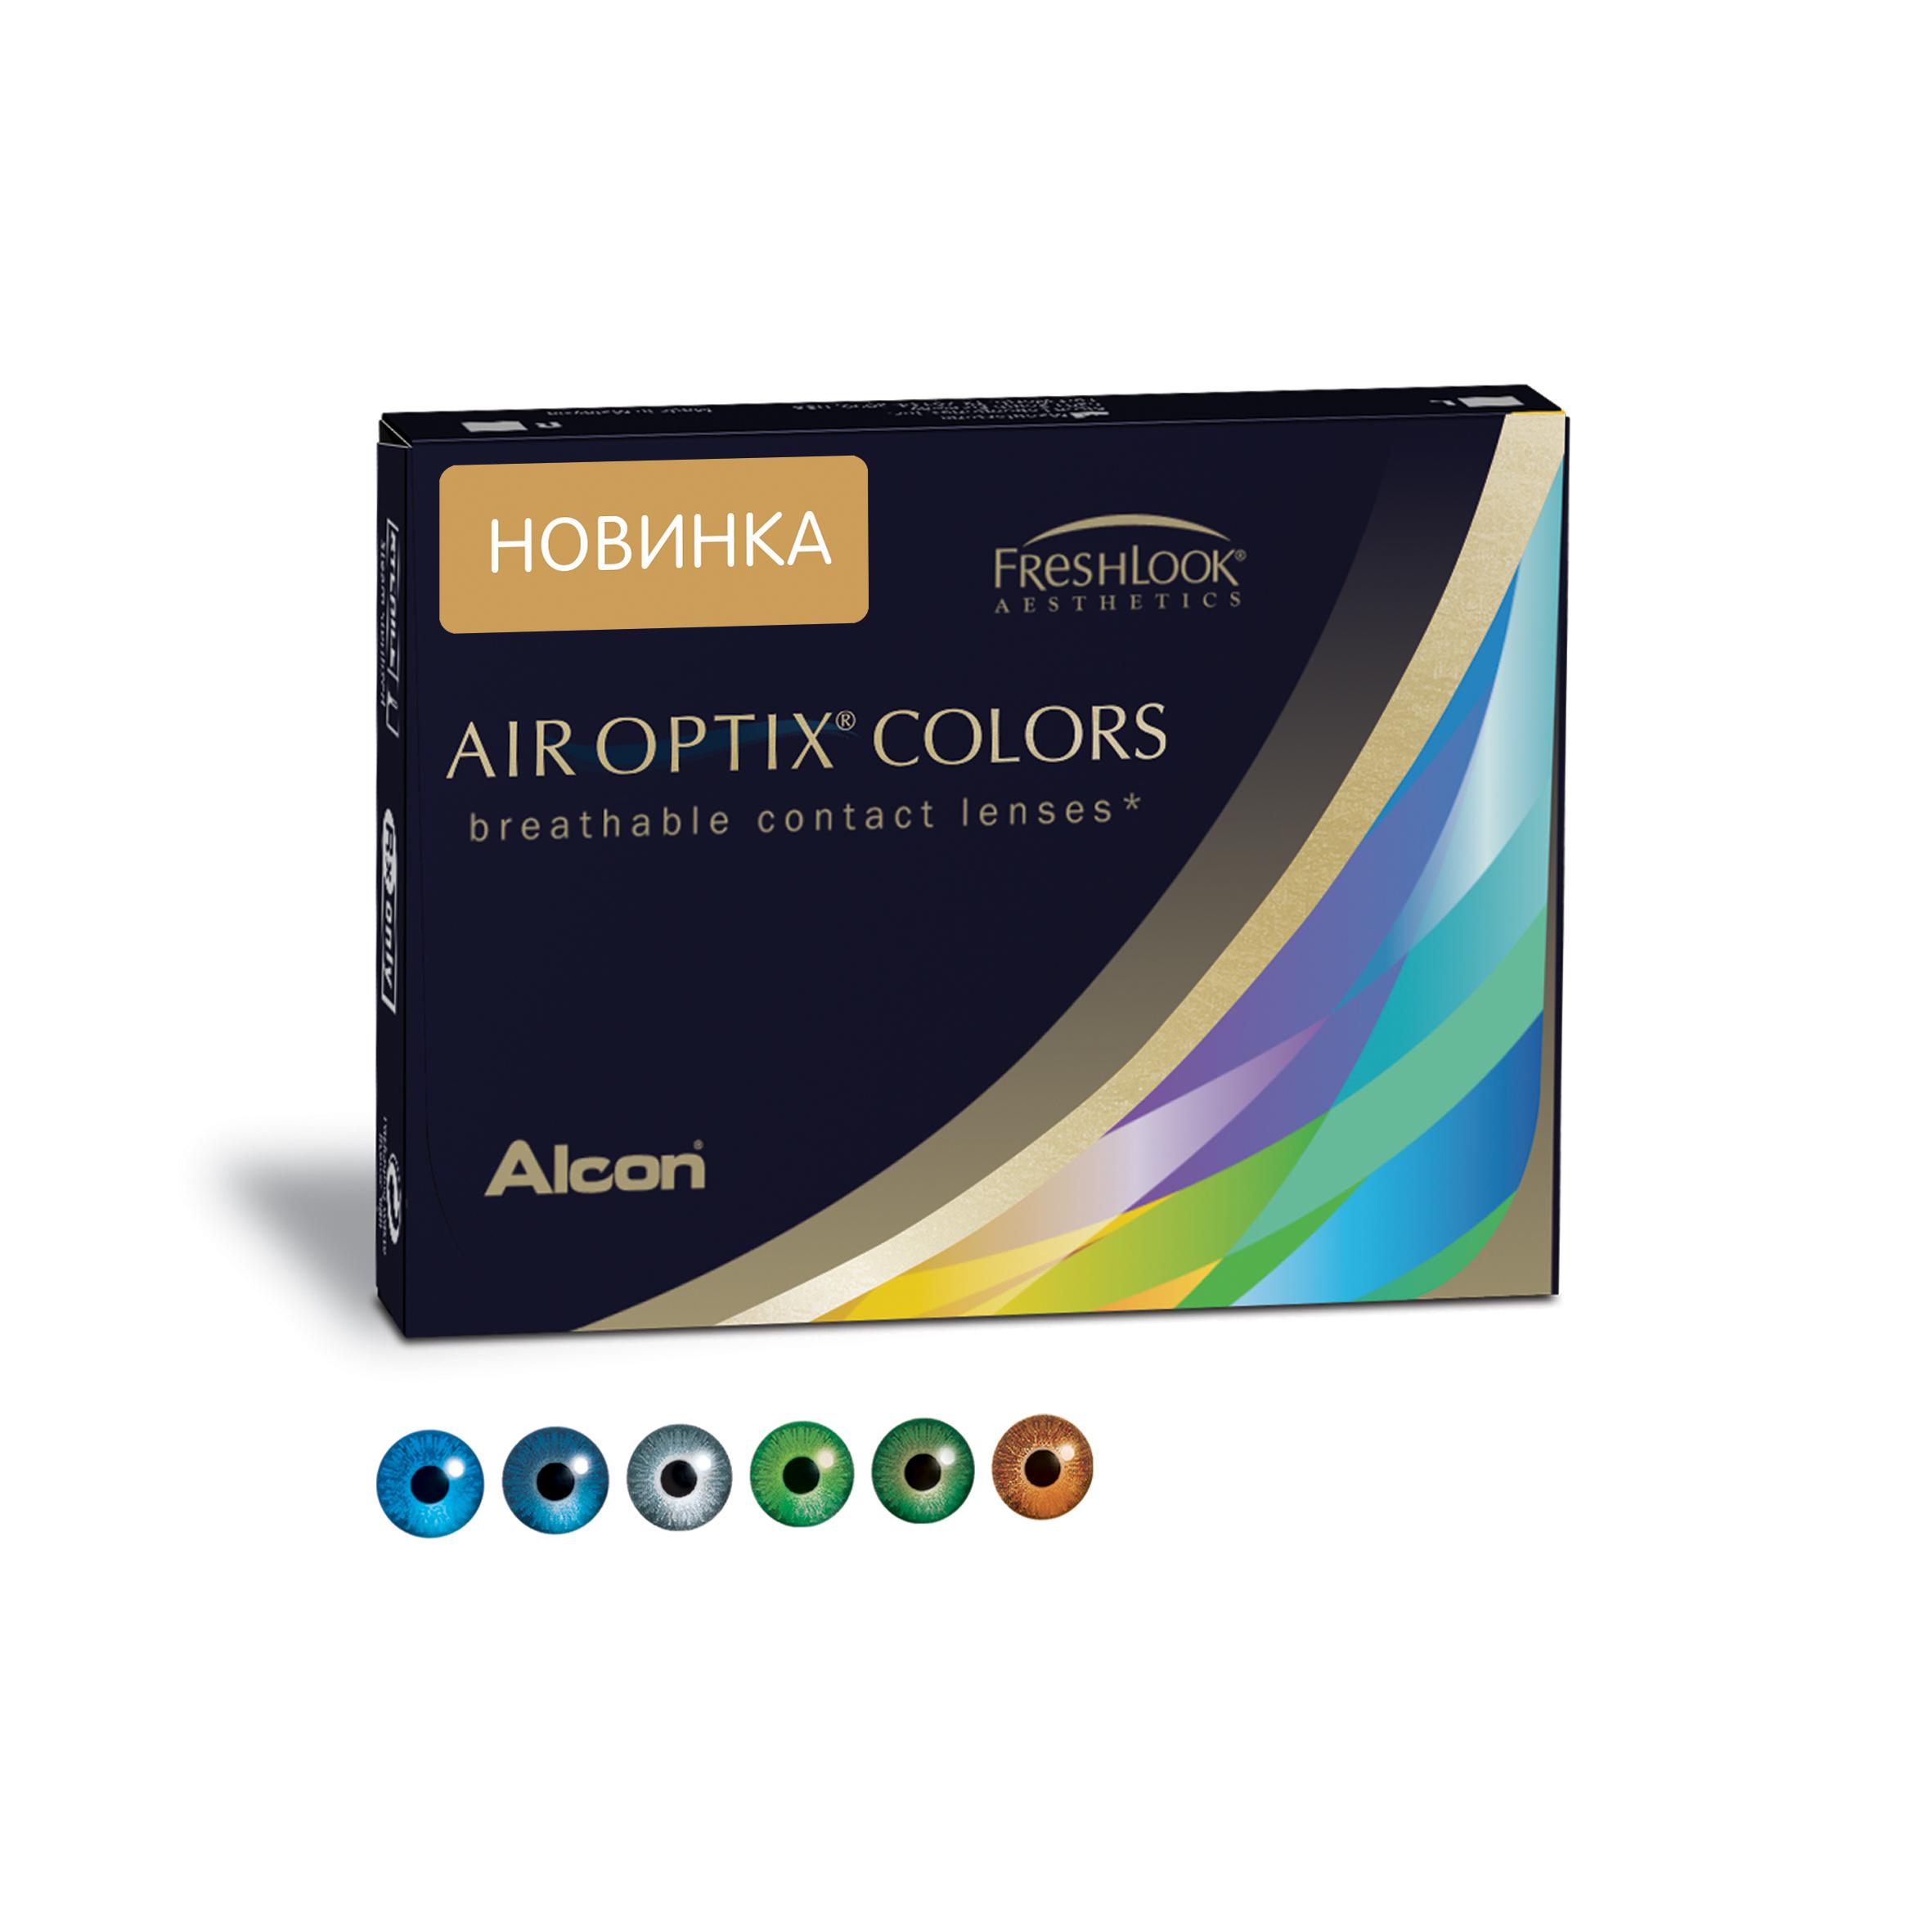 Аlcon контактные линзы Air Optix Colors 2 шт -0.00 Brilliant Blue ( 31746086 )